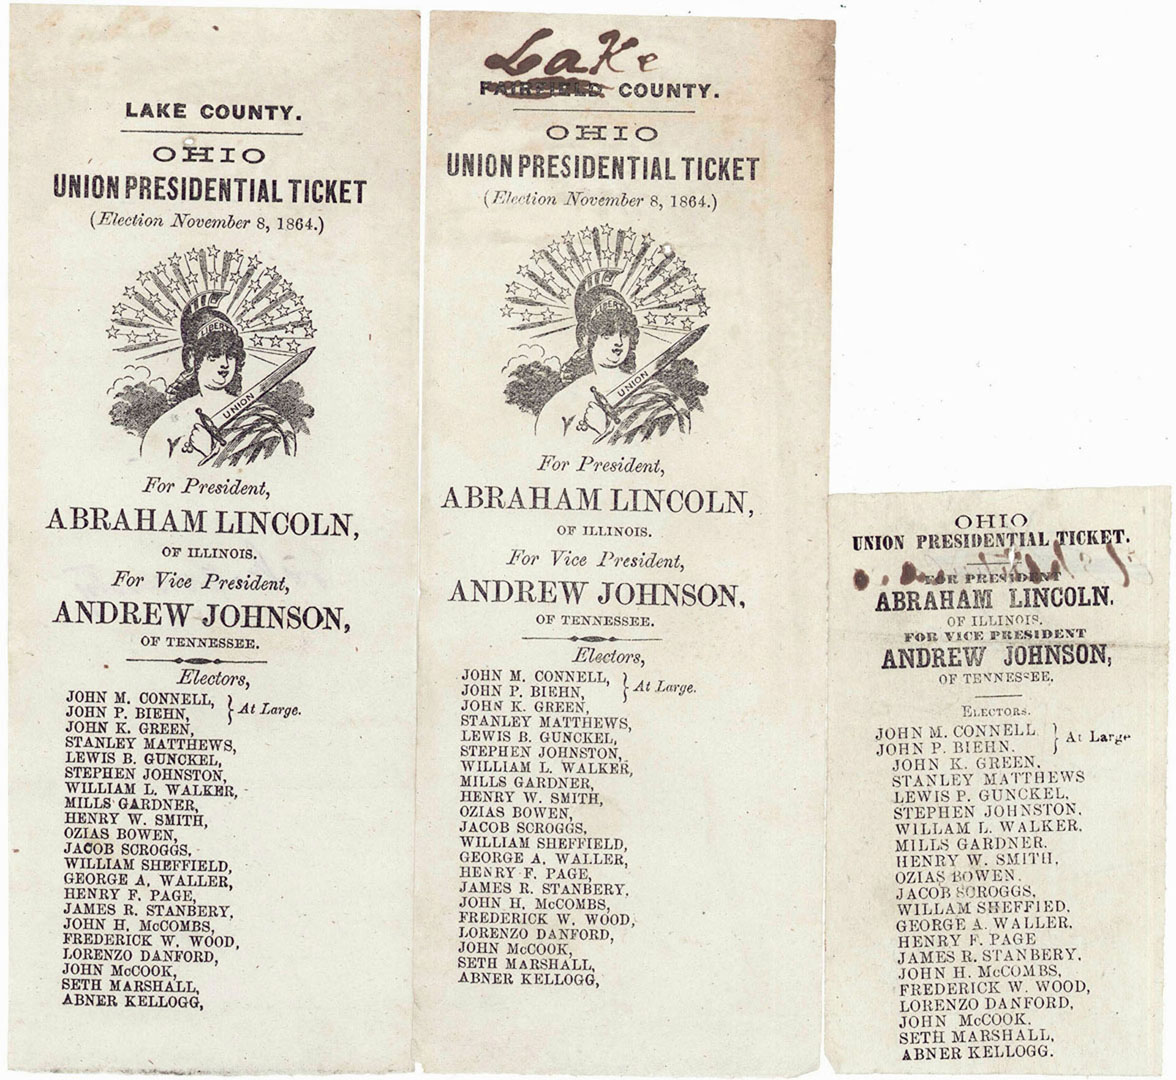 Lot 2872296: Three 1864 Election Ballots from Ohio